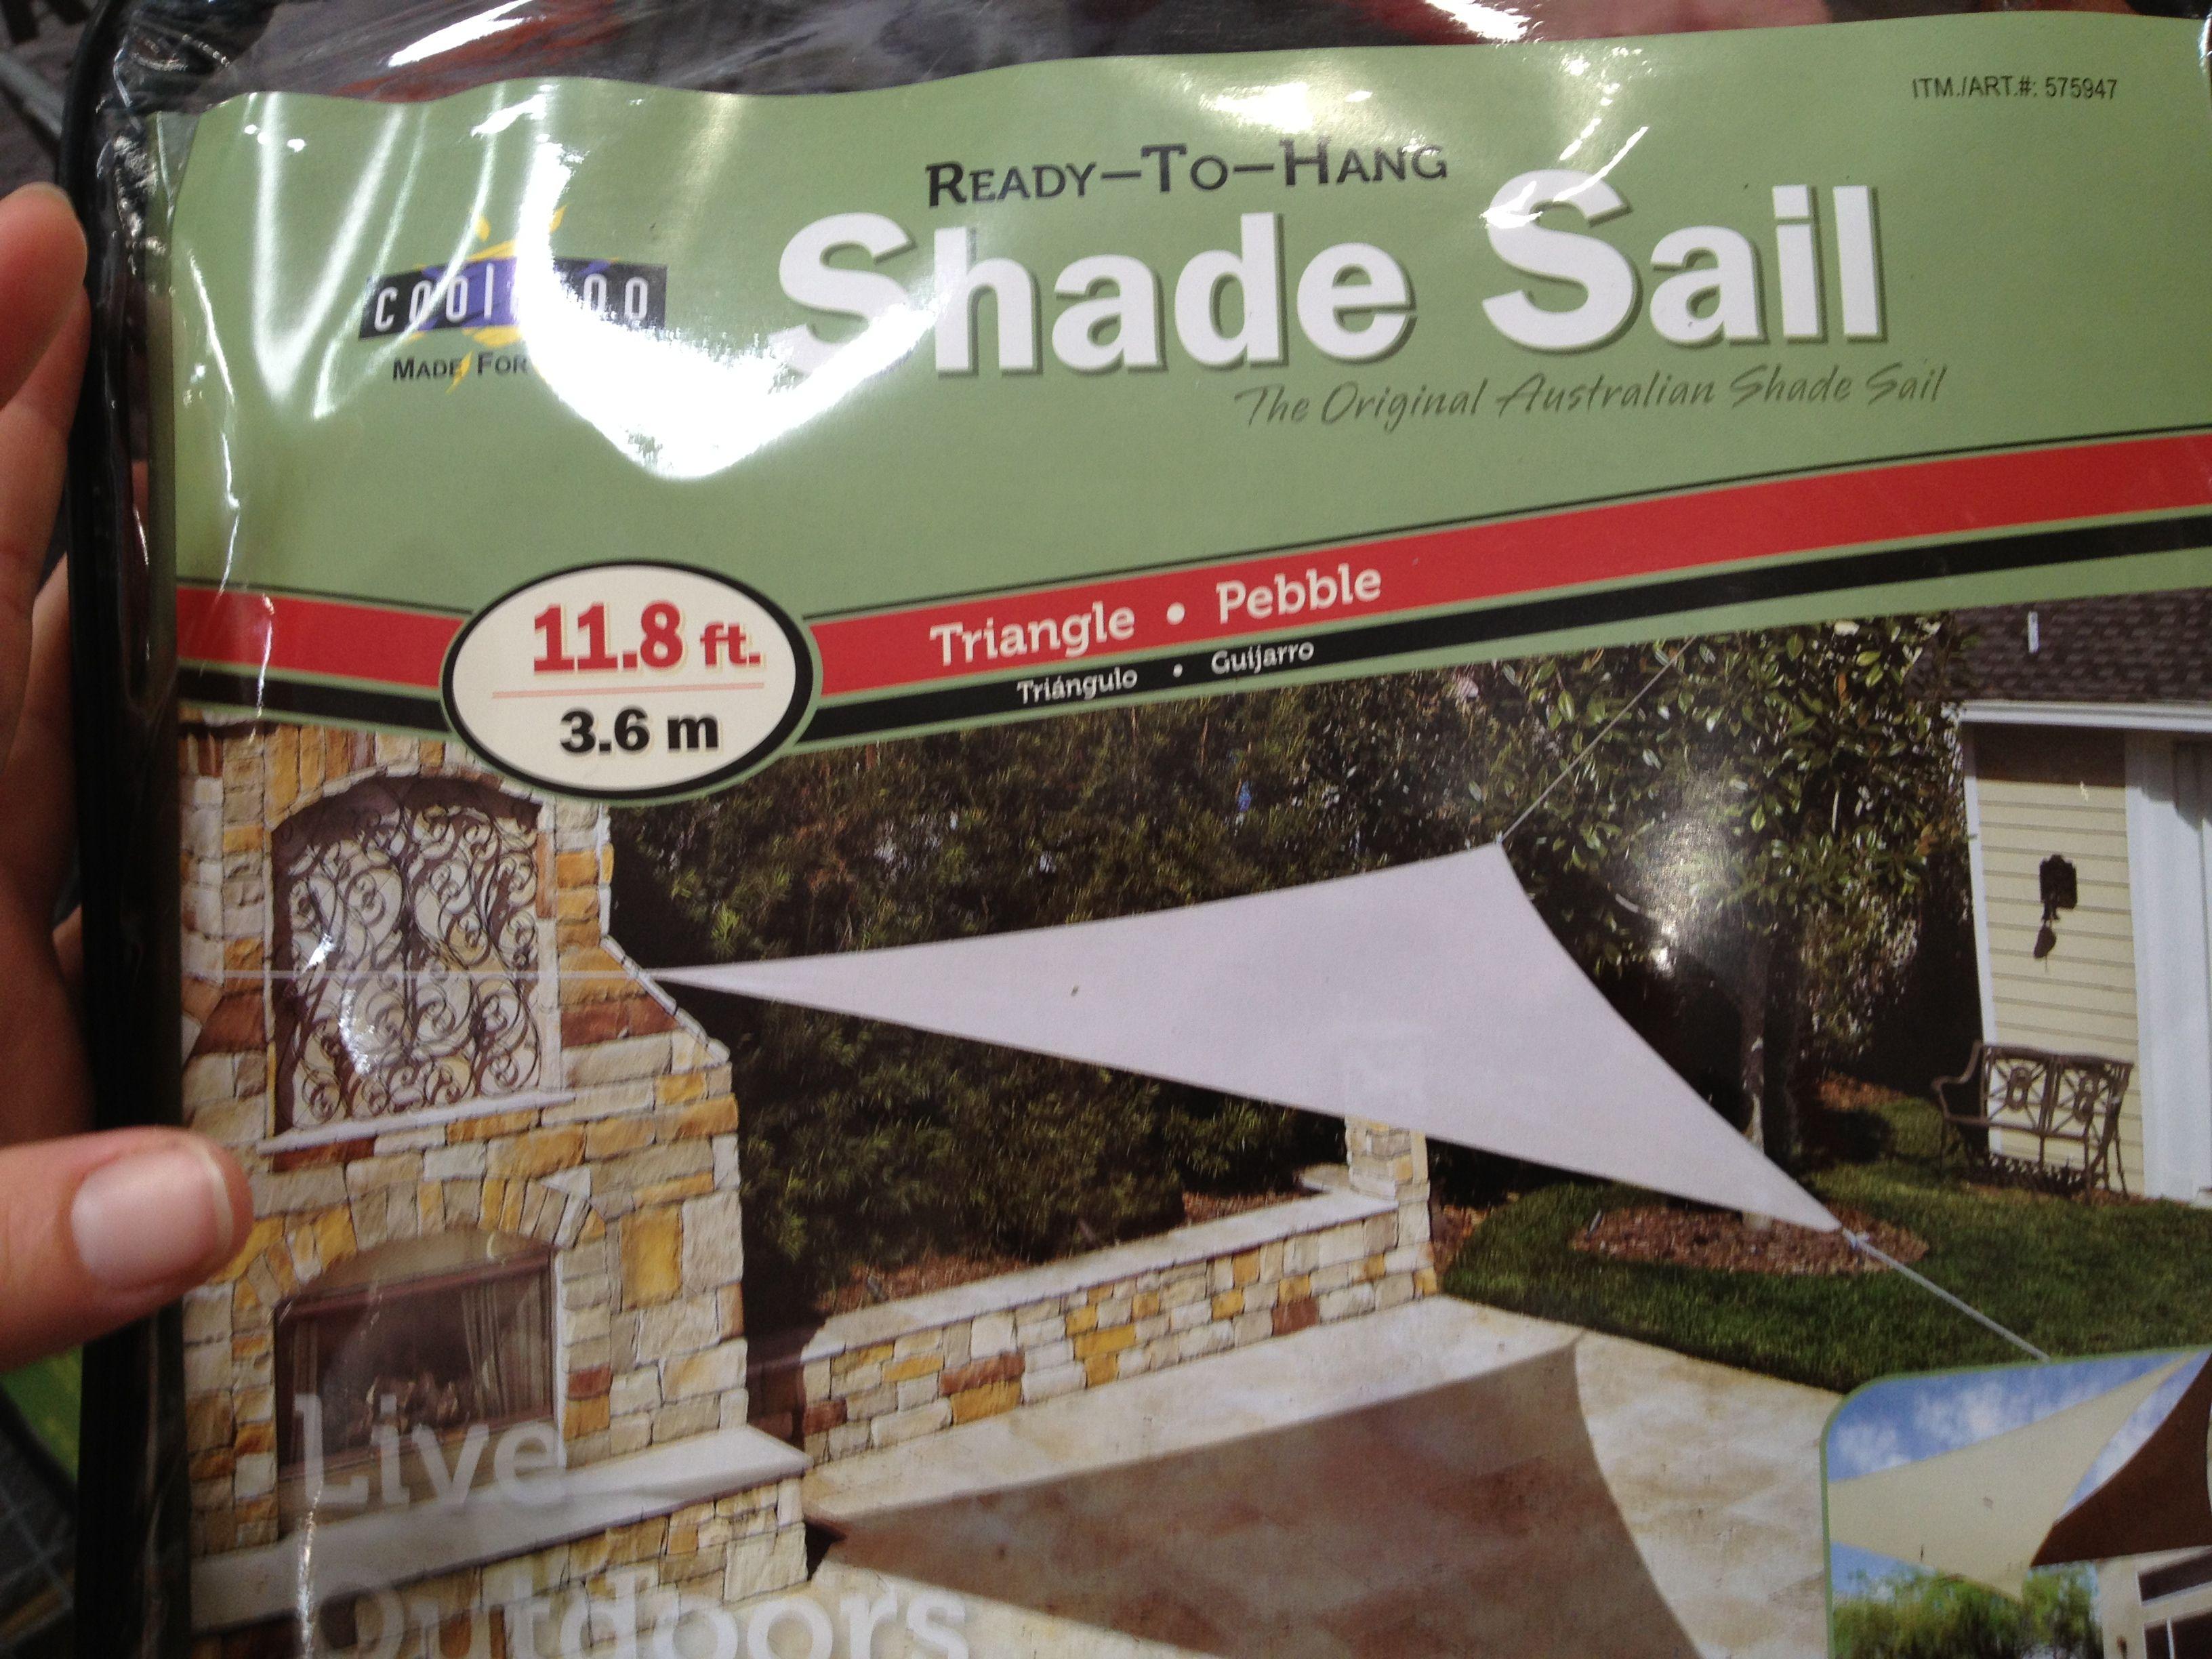 Triangle Shade Sail Via Costco Shade Sails Pinterest